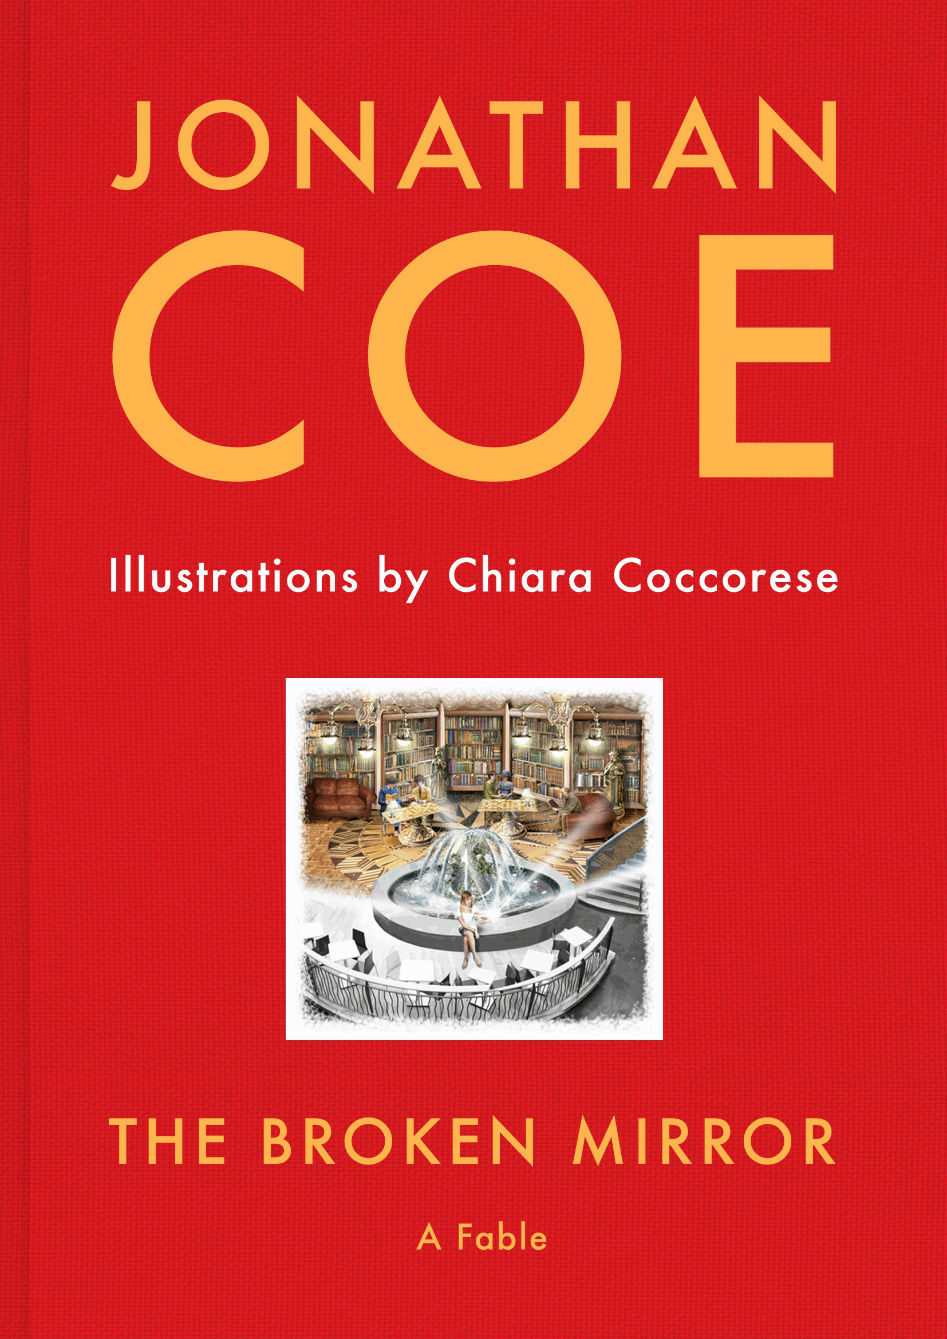 Jonathan Coe The Broken Mirror Review Potent